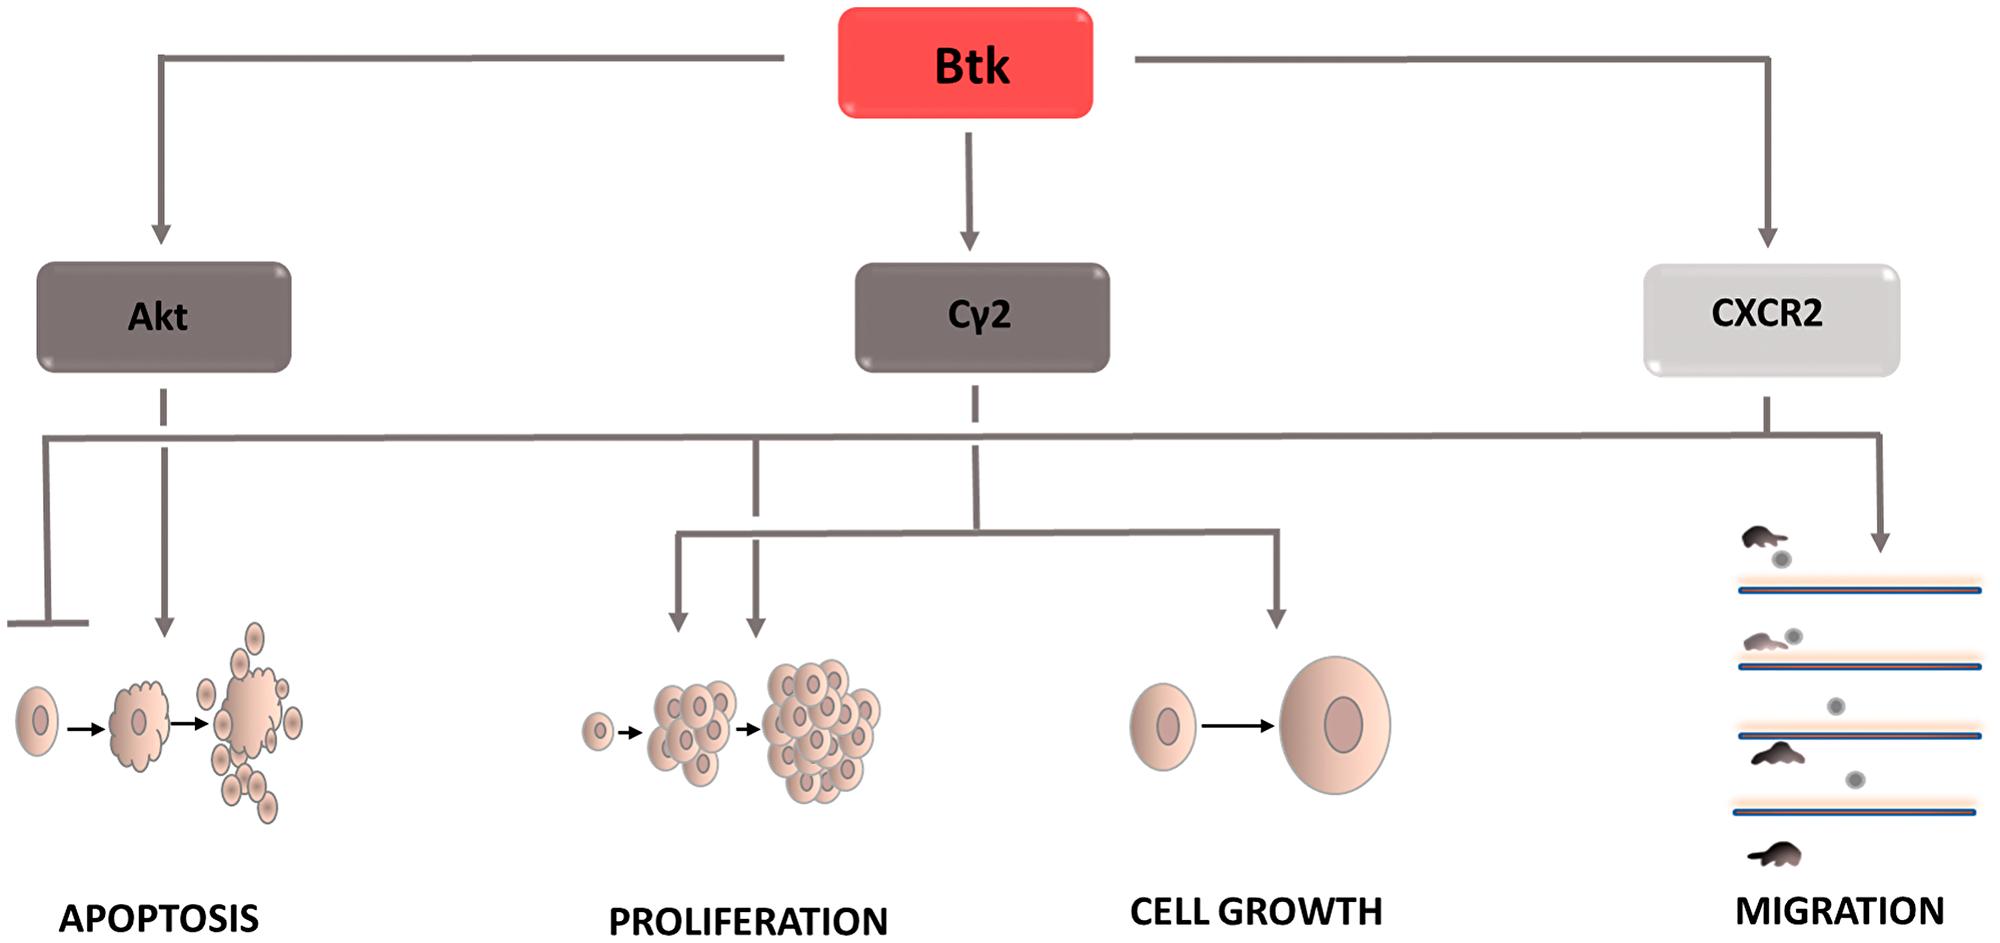 Carcinogenic effect of Bruton's tyrosine kinase (Btk).